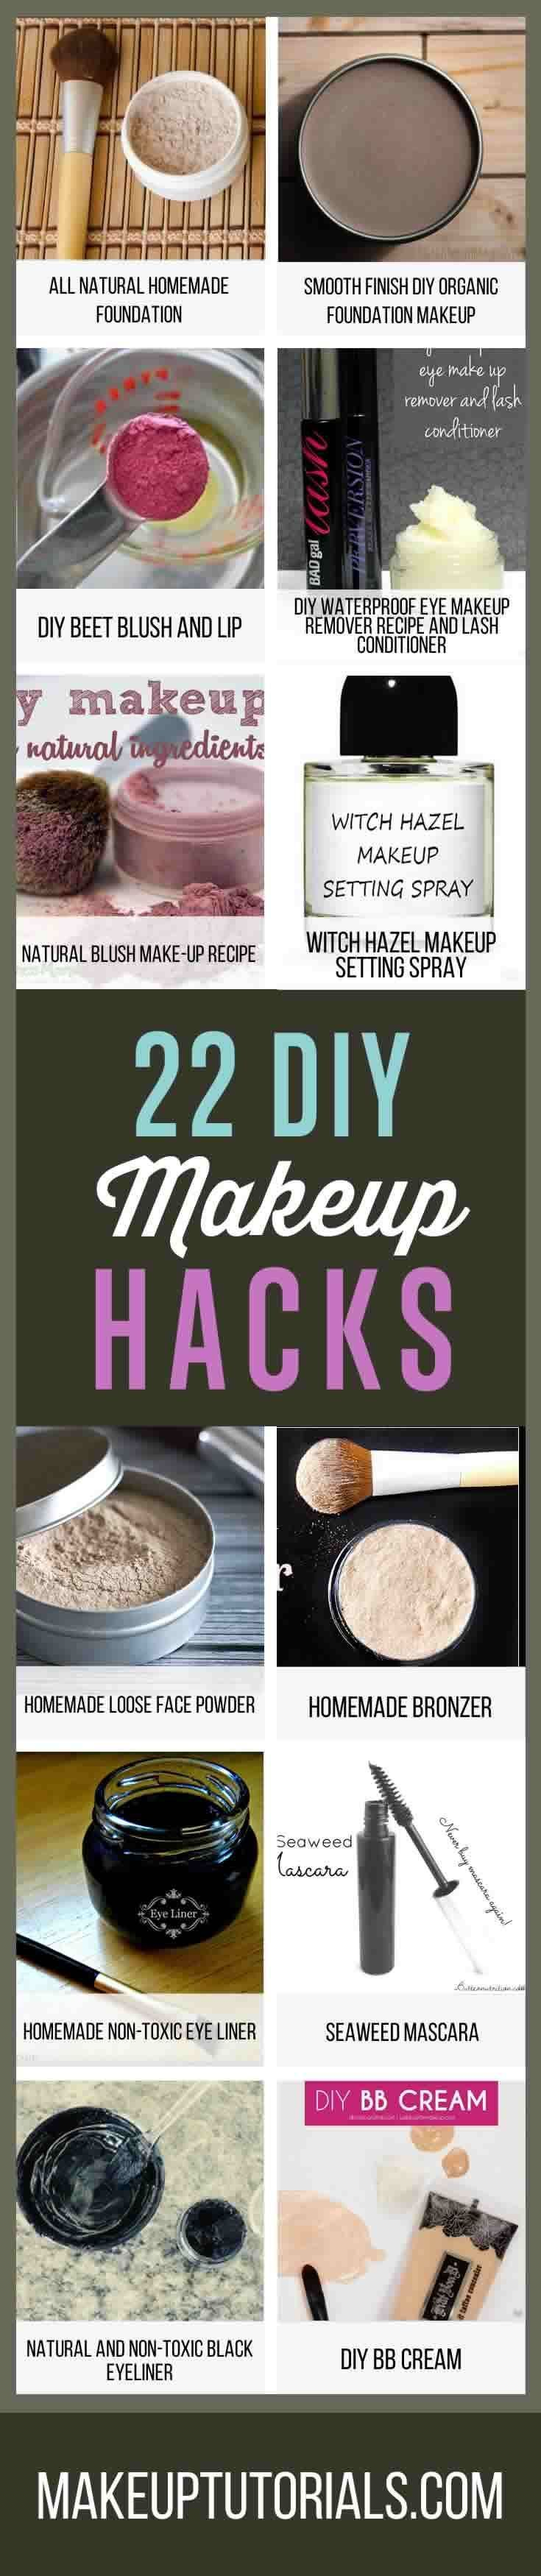 22 Diy Cosmetics Easy Makeup Recipe Ideas Makeup Tutorials Diy Makeup Diy Cosmetics Easy Diy Cosmetics